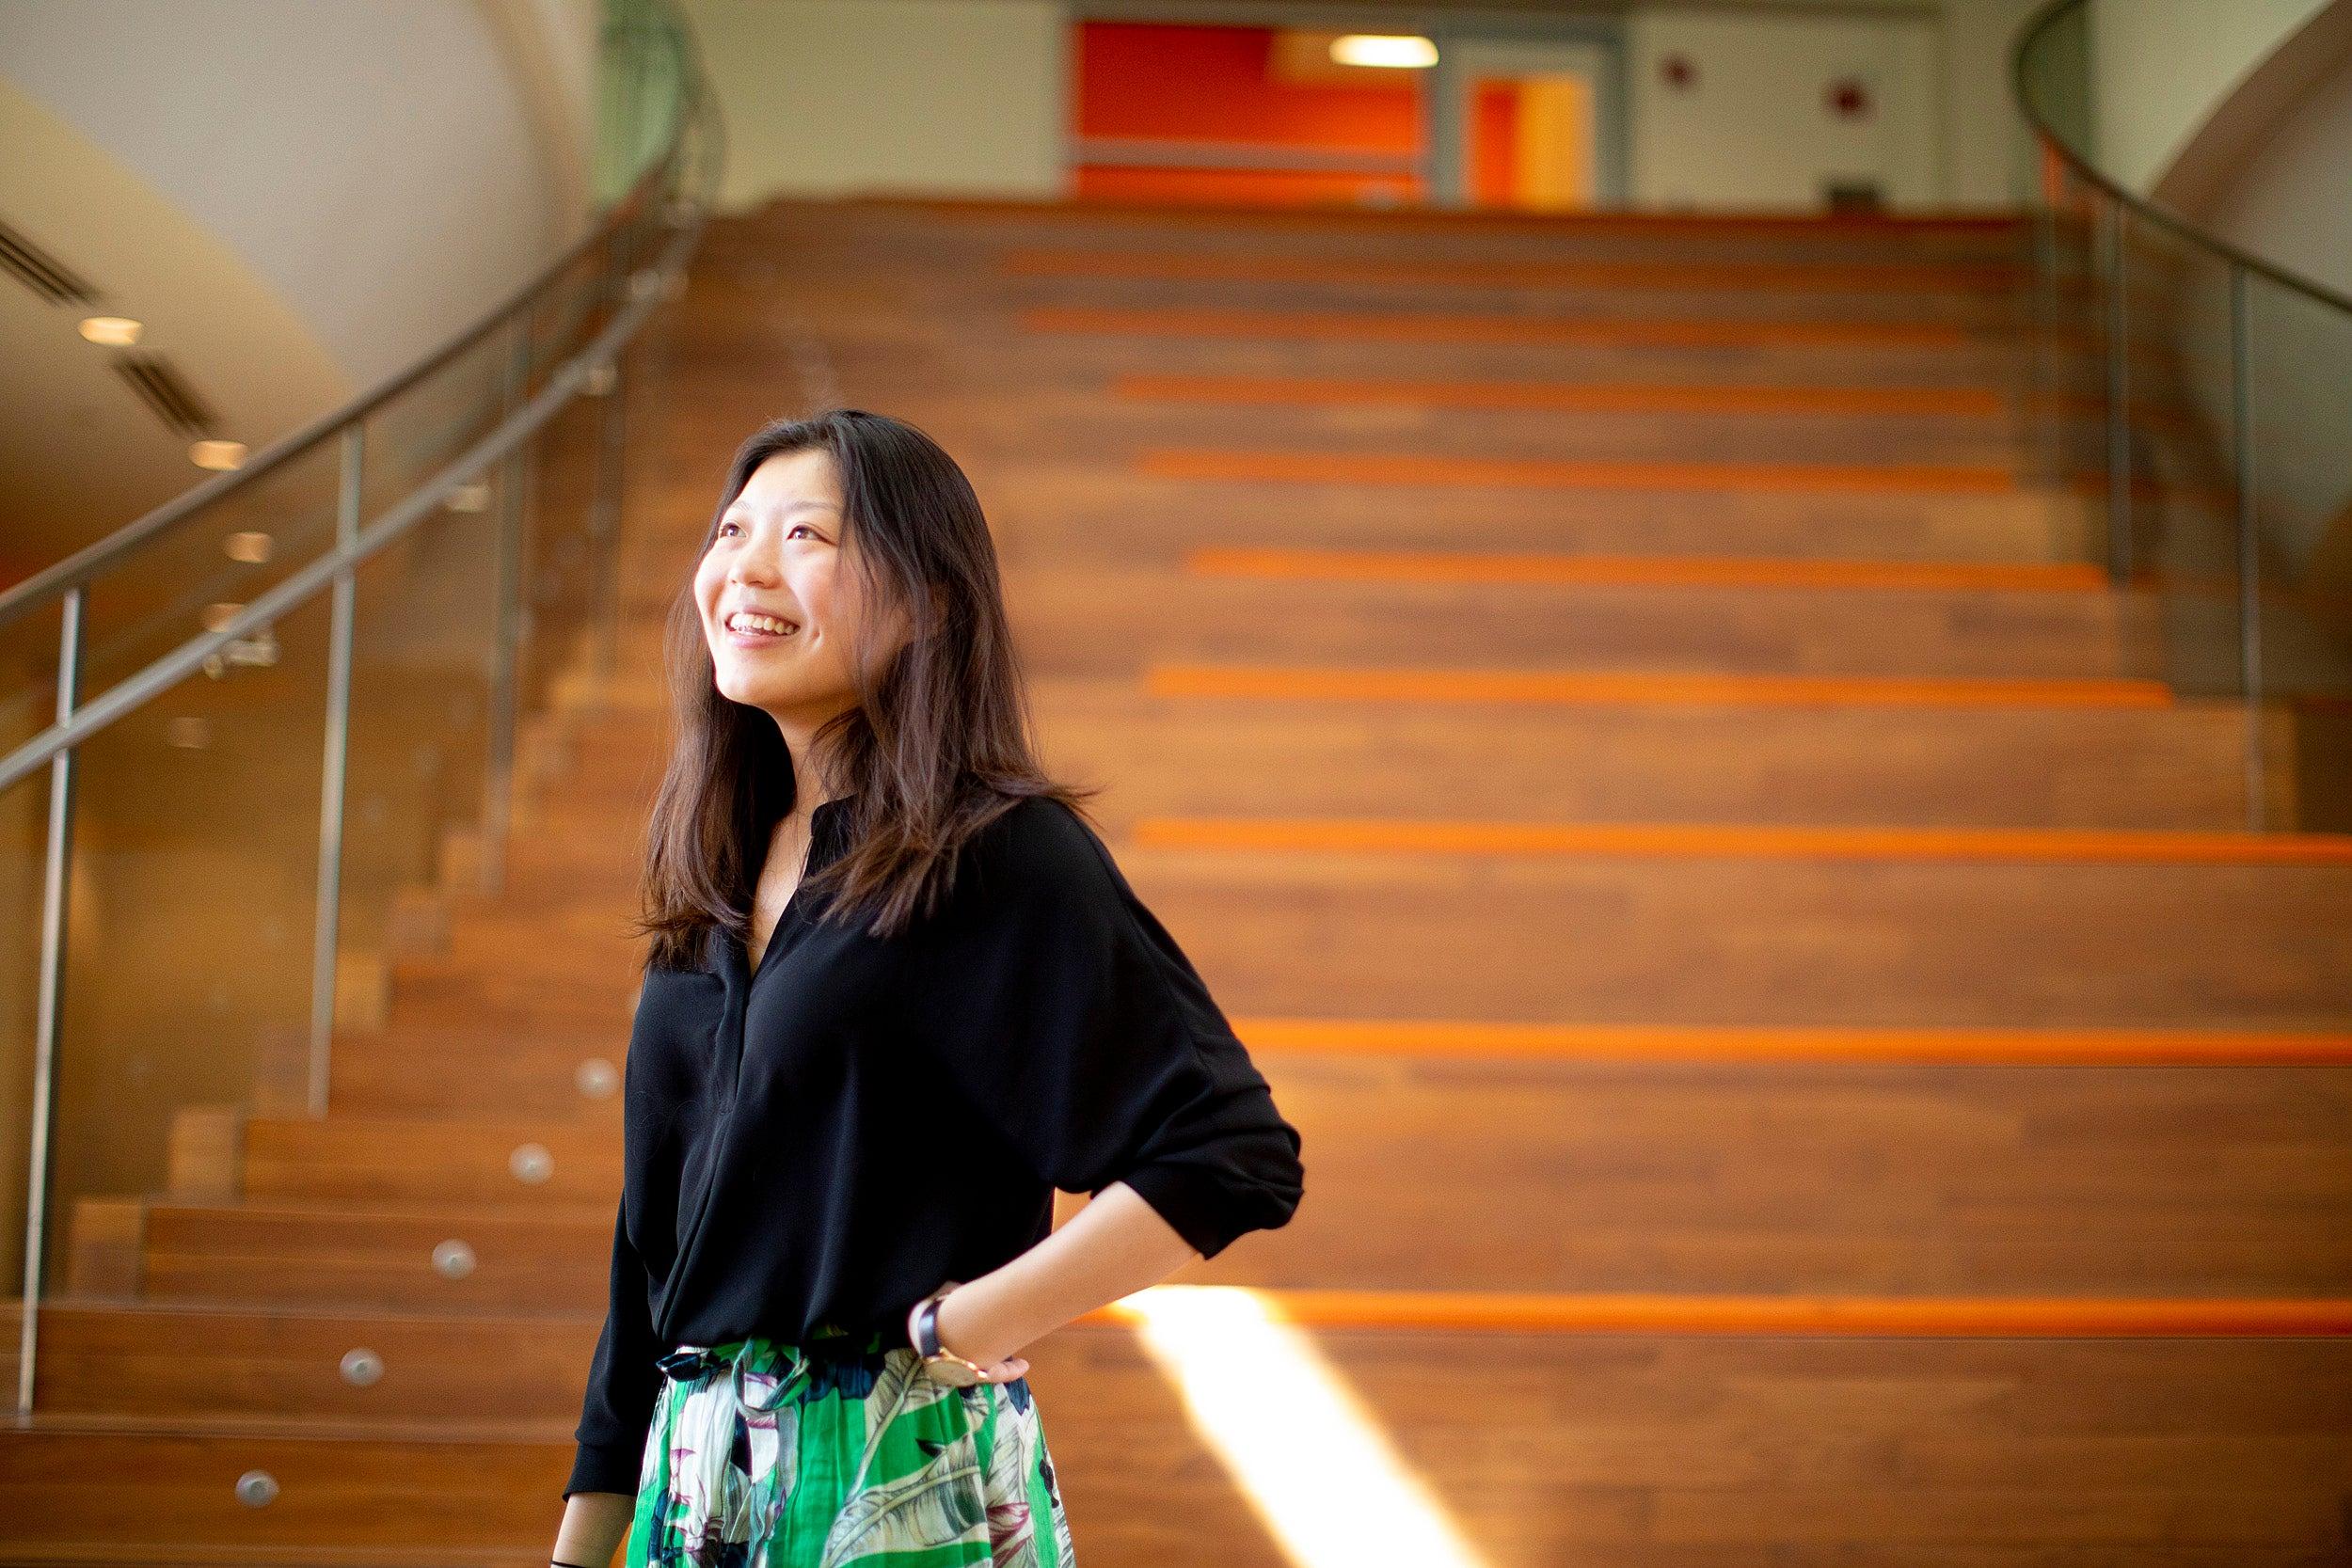 Harvard grad follows a passion for global health